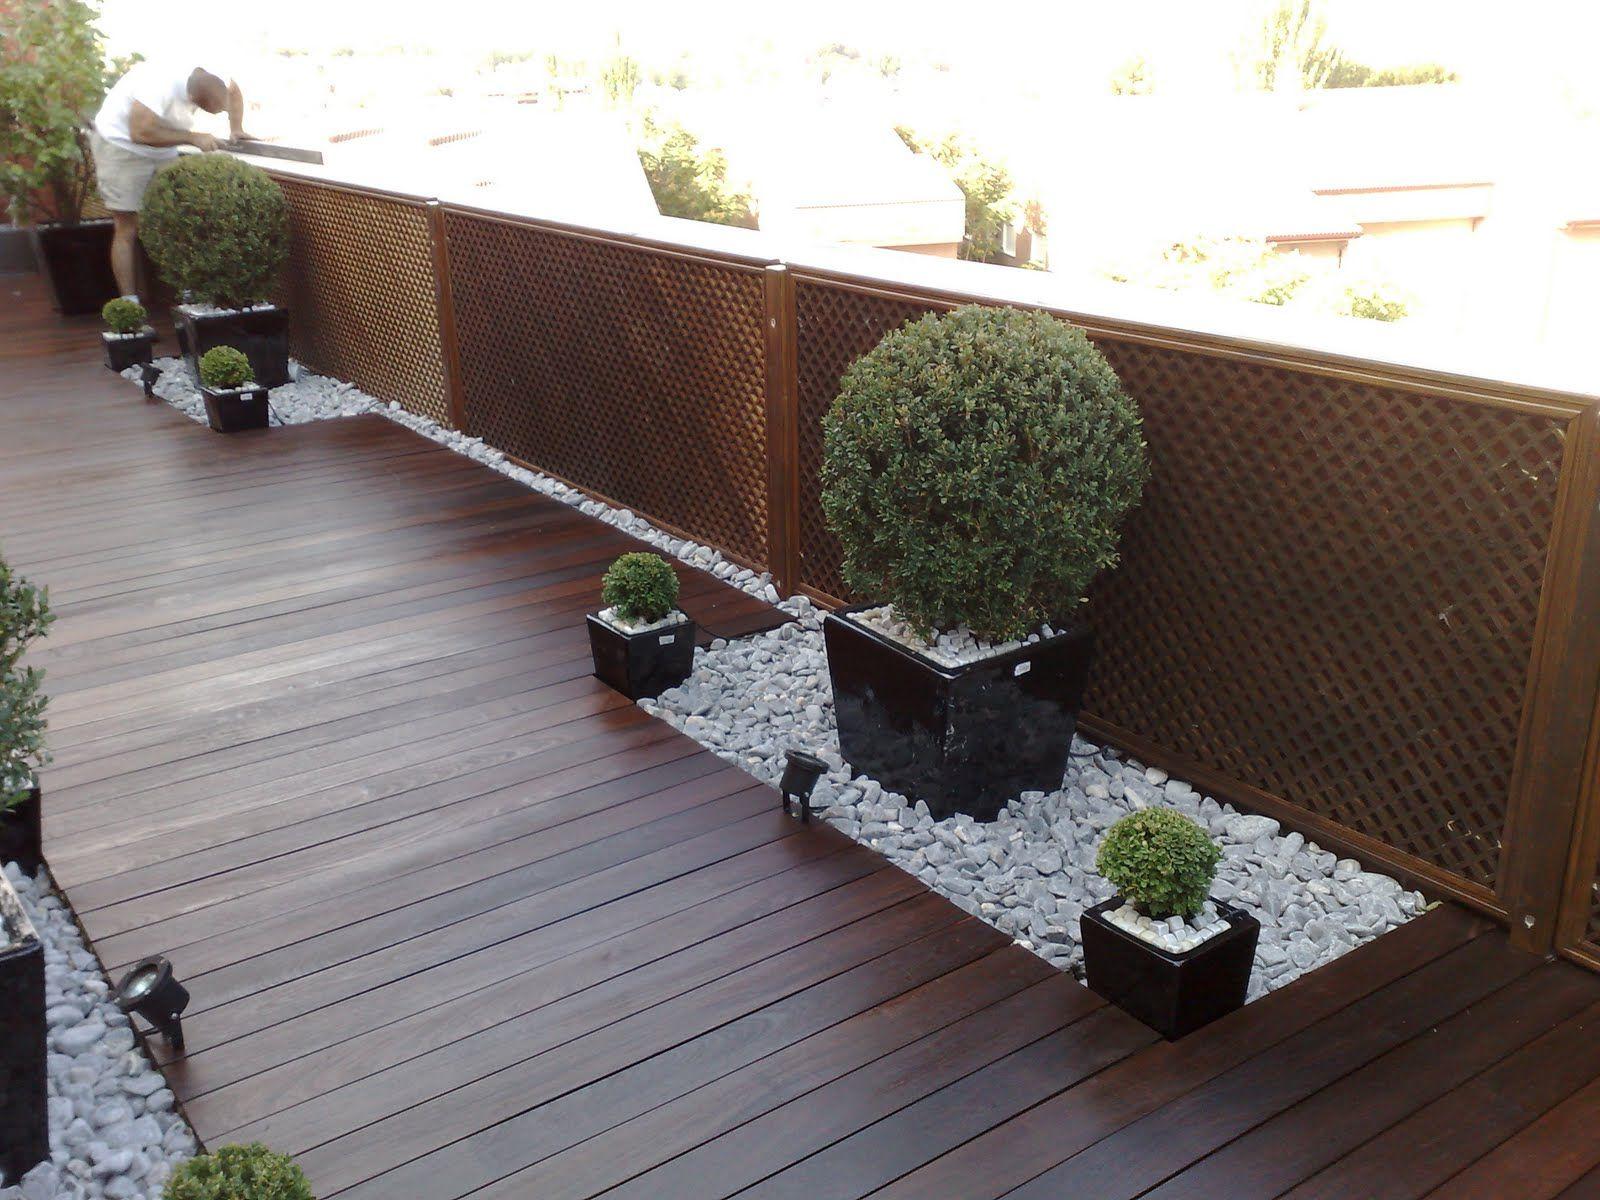 Jardines contemporaneos peque os inspiraci n de dise o - Jardines interiores pequenos ...